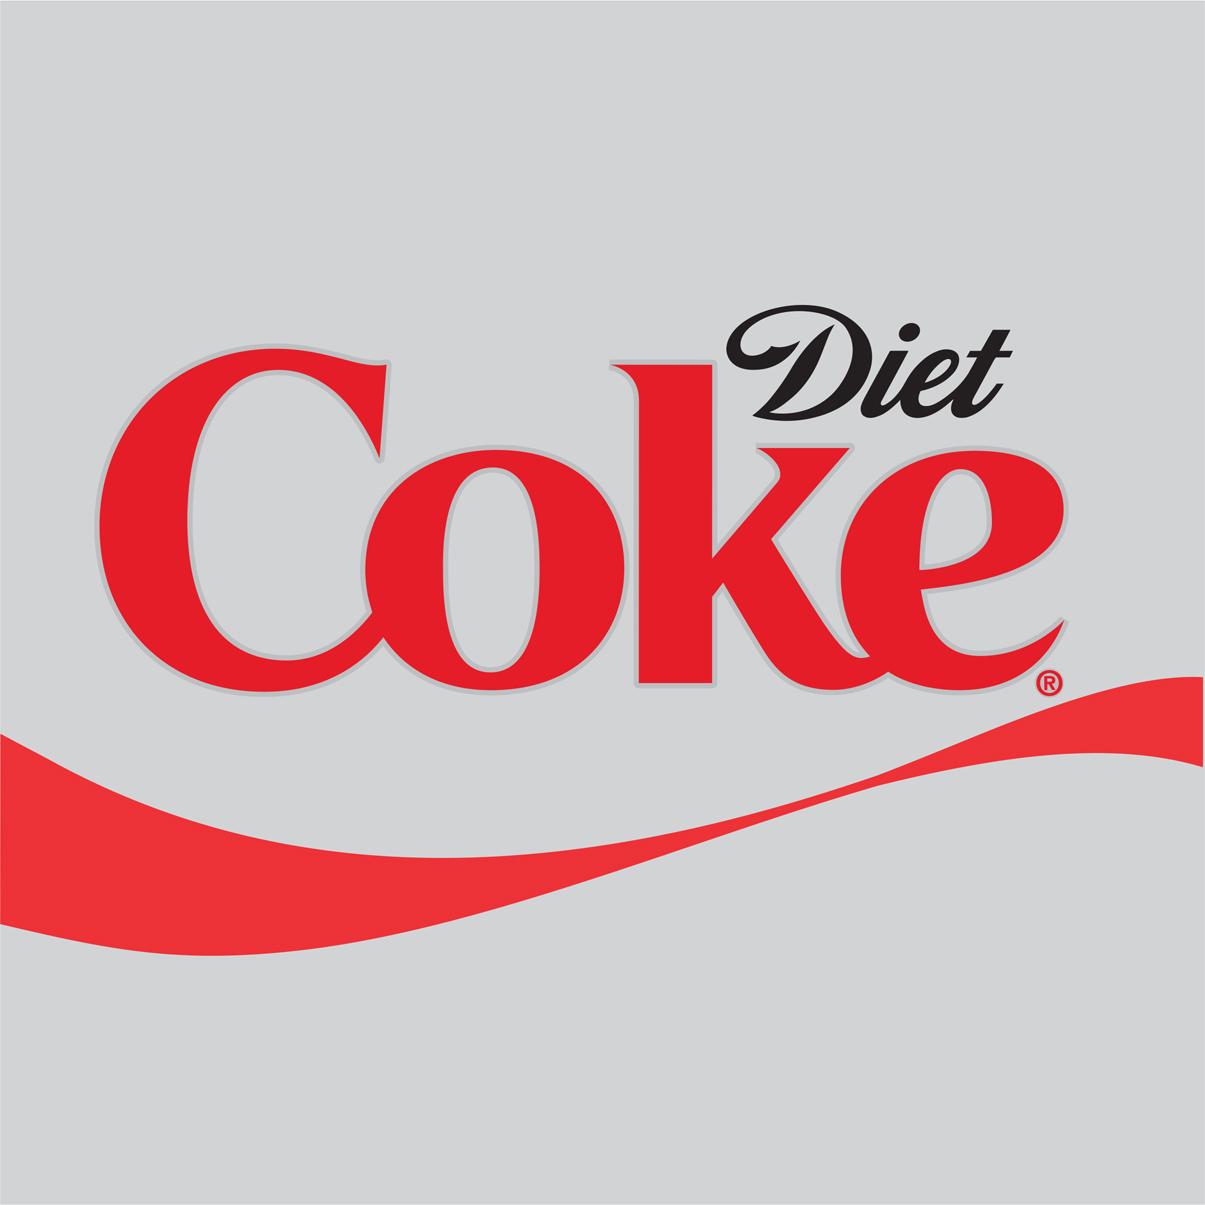 DietCokeLogo.jpg